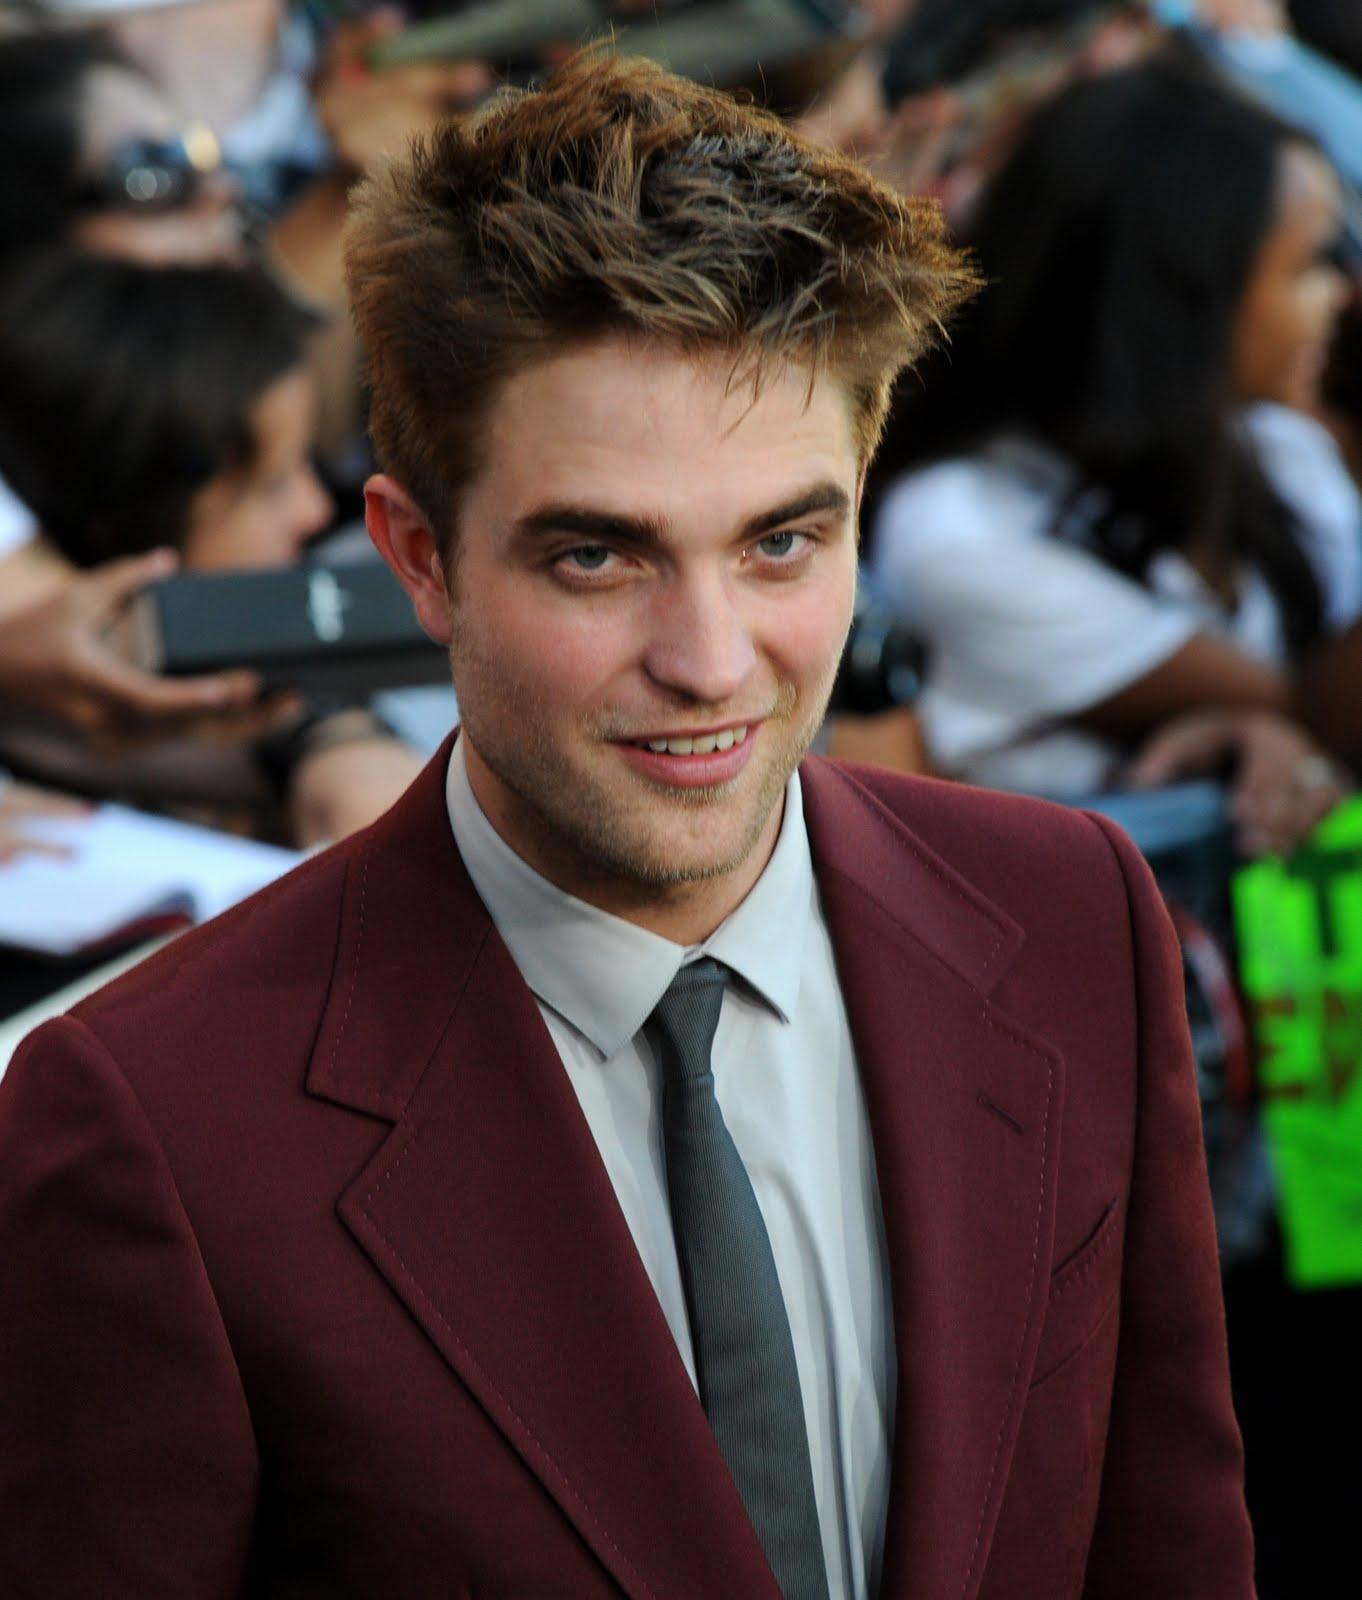 Robert Pattinson: Robert Pattinson Life: Great New Interview